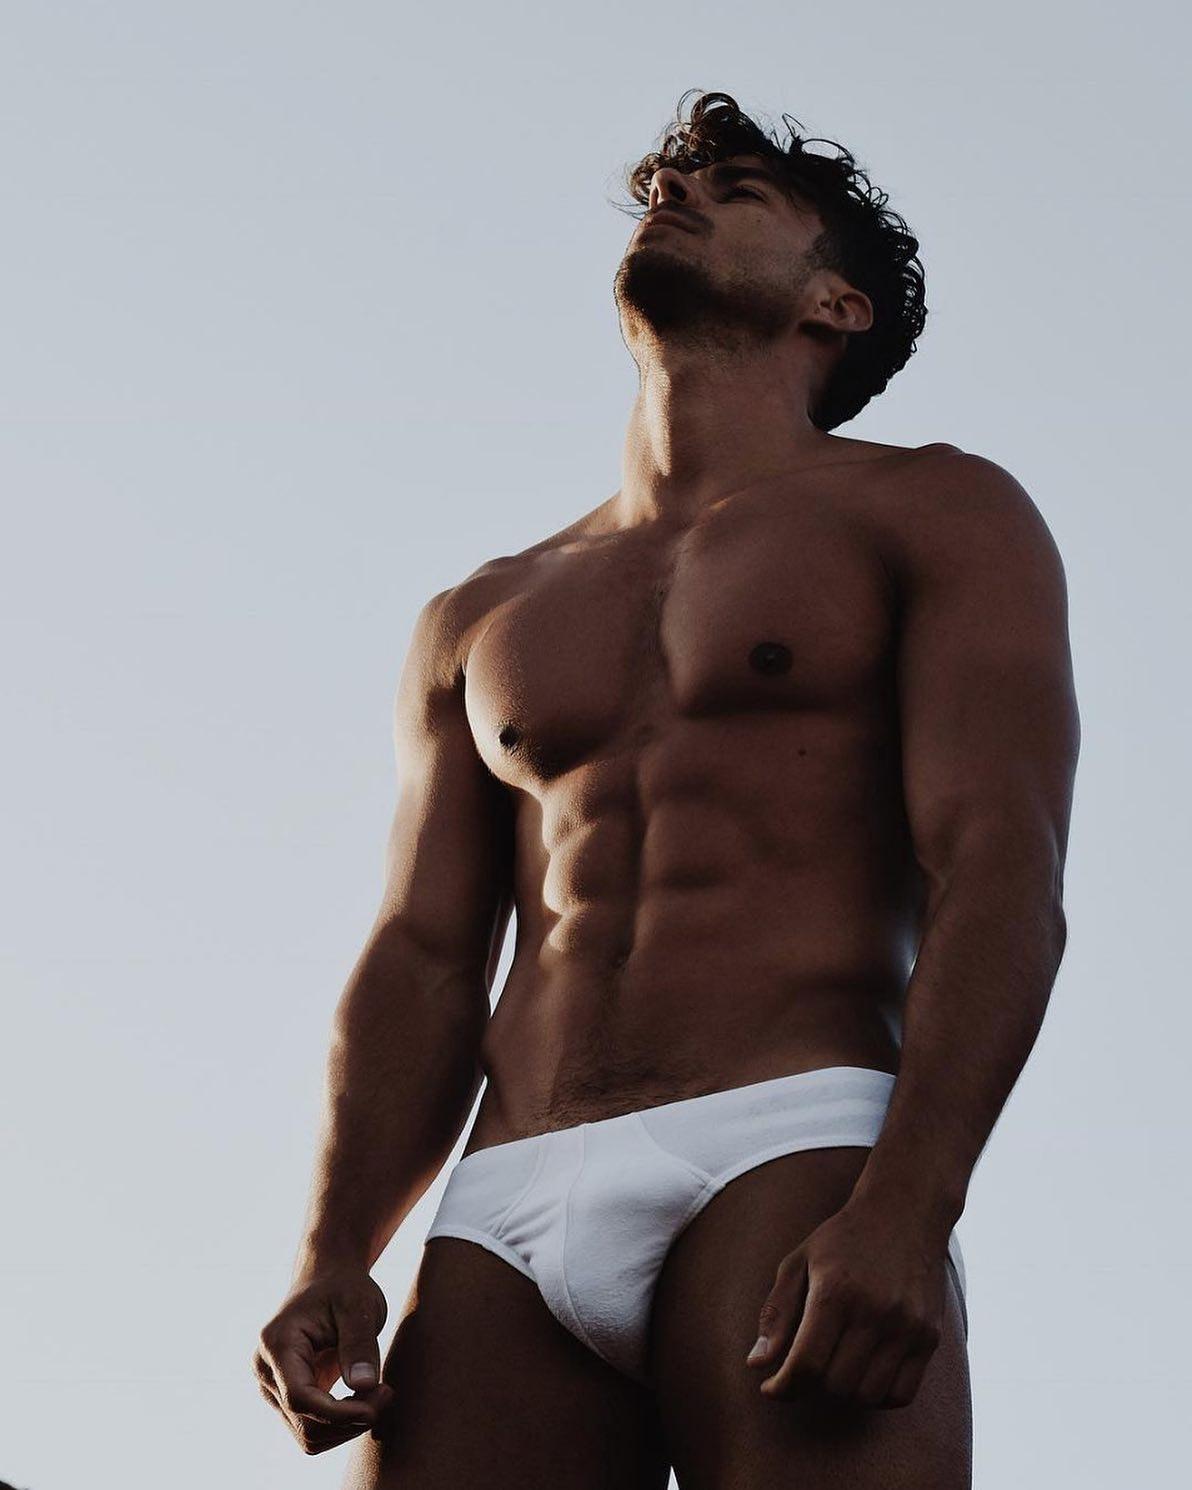 #men #bulge #abs #muscle #underwear #briefs